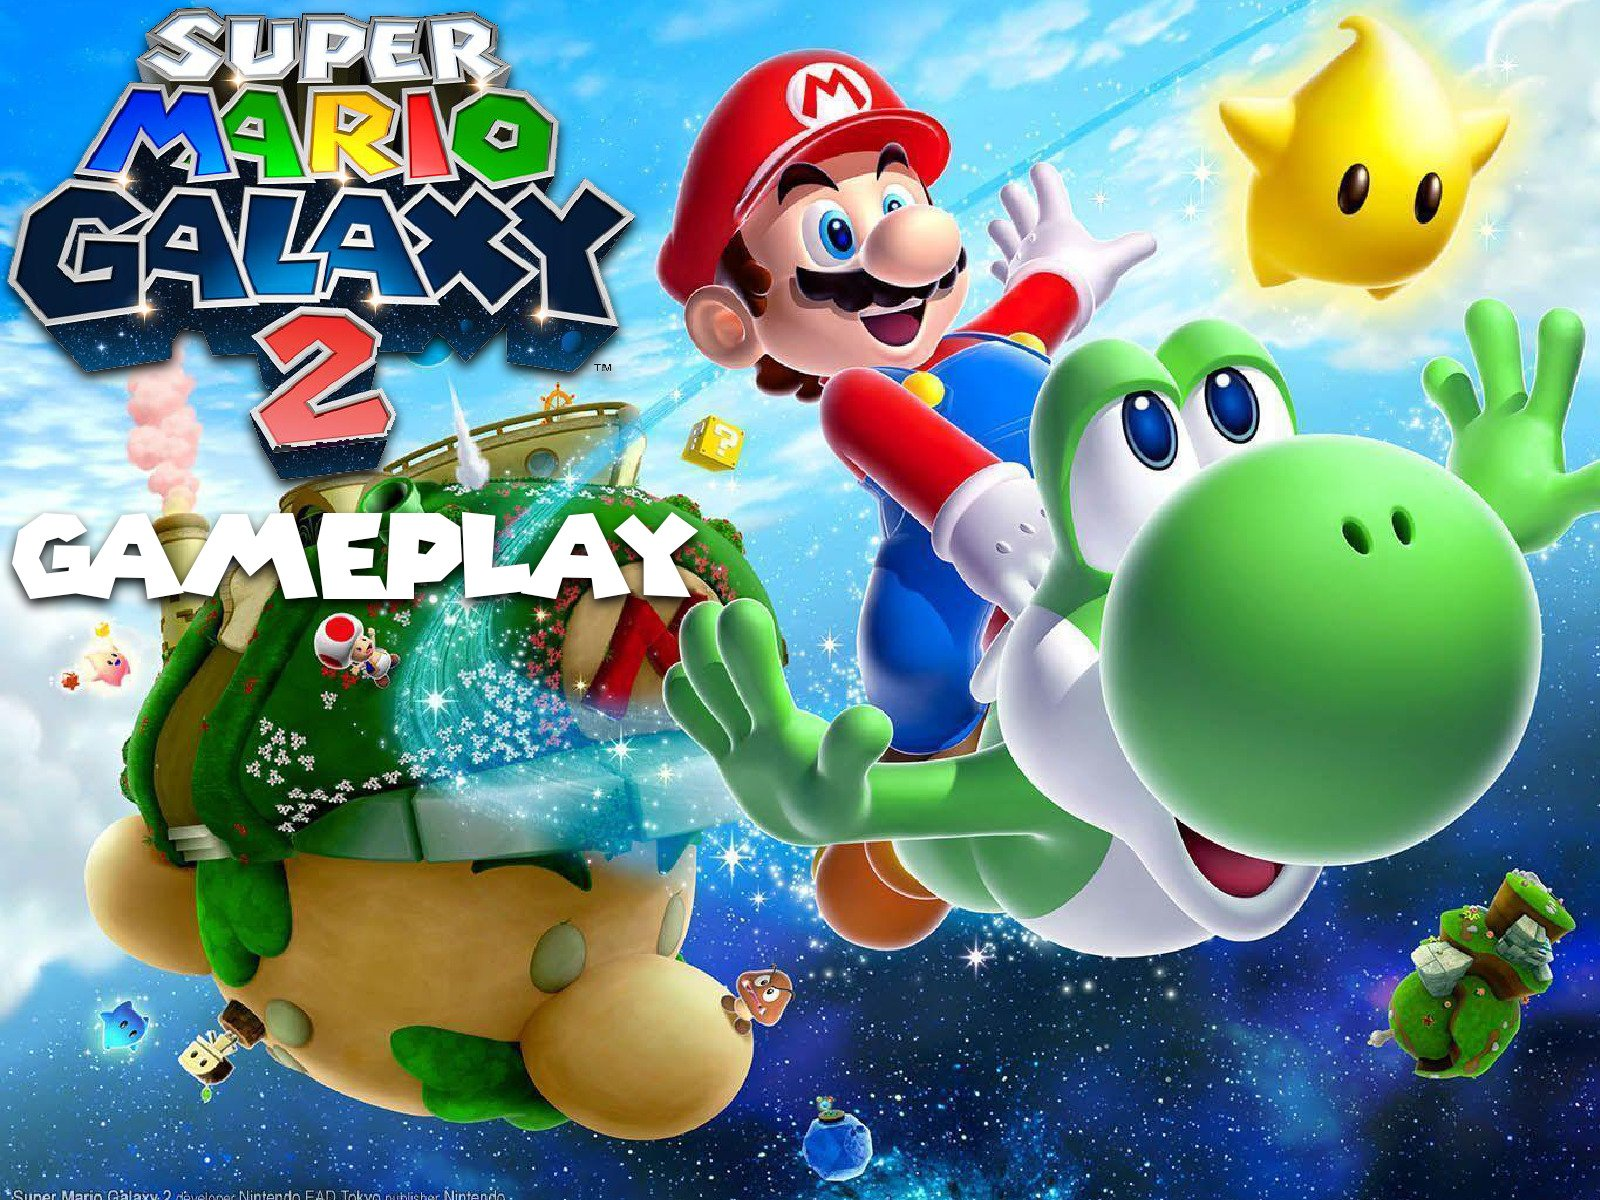 Amazon.com: Clip: Super Mario Galaxy 2 Gameplay: Michael Cottrell ...